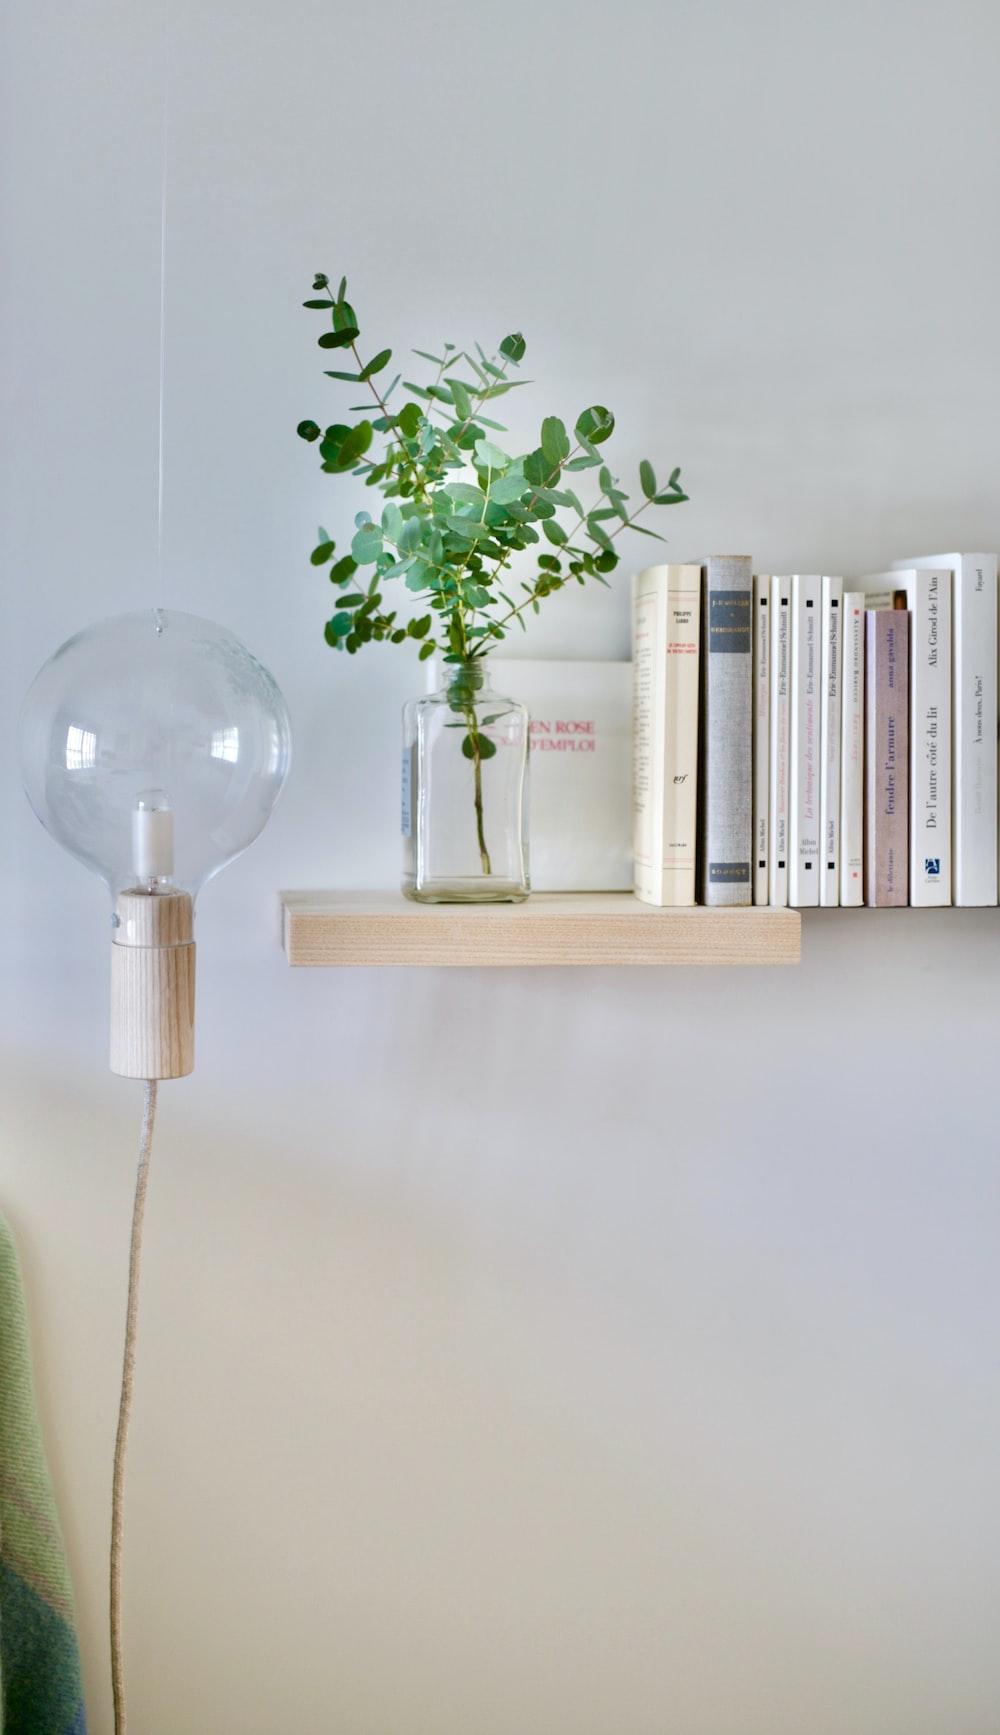 turned-off sconce lamp beside wall bookshelf